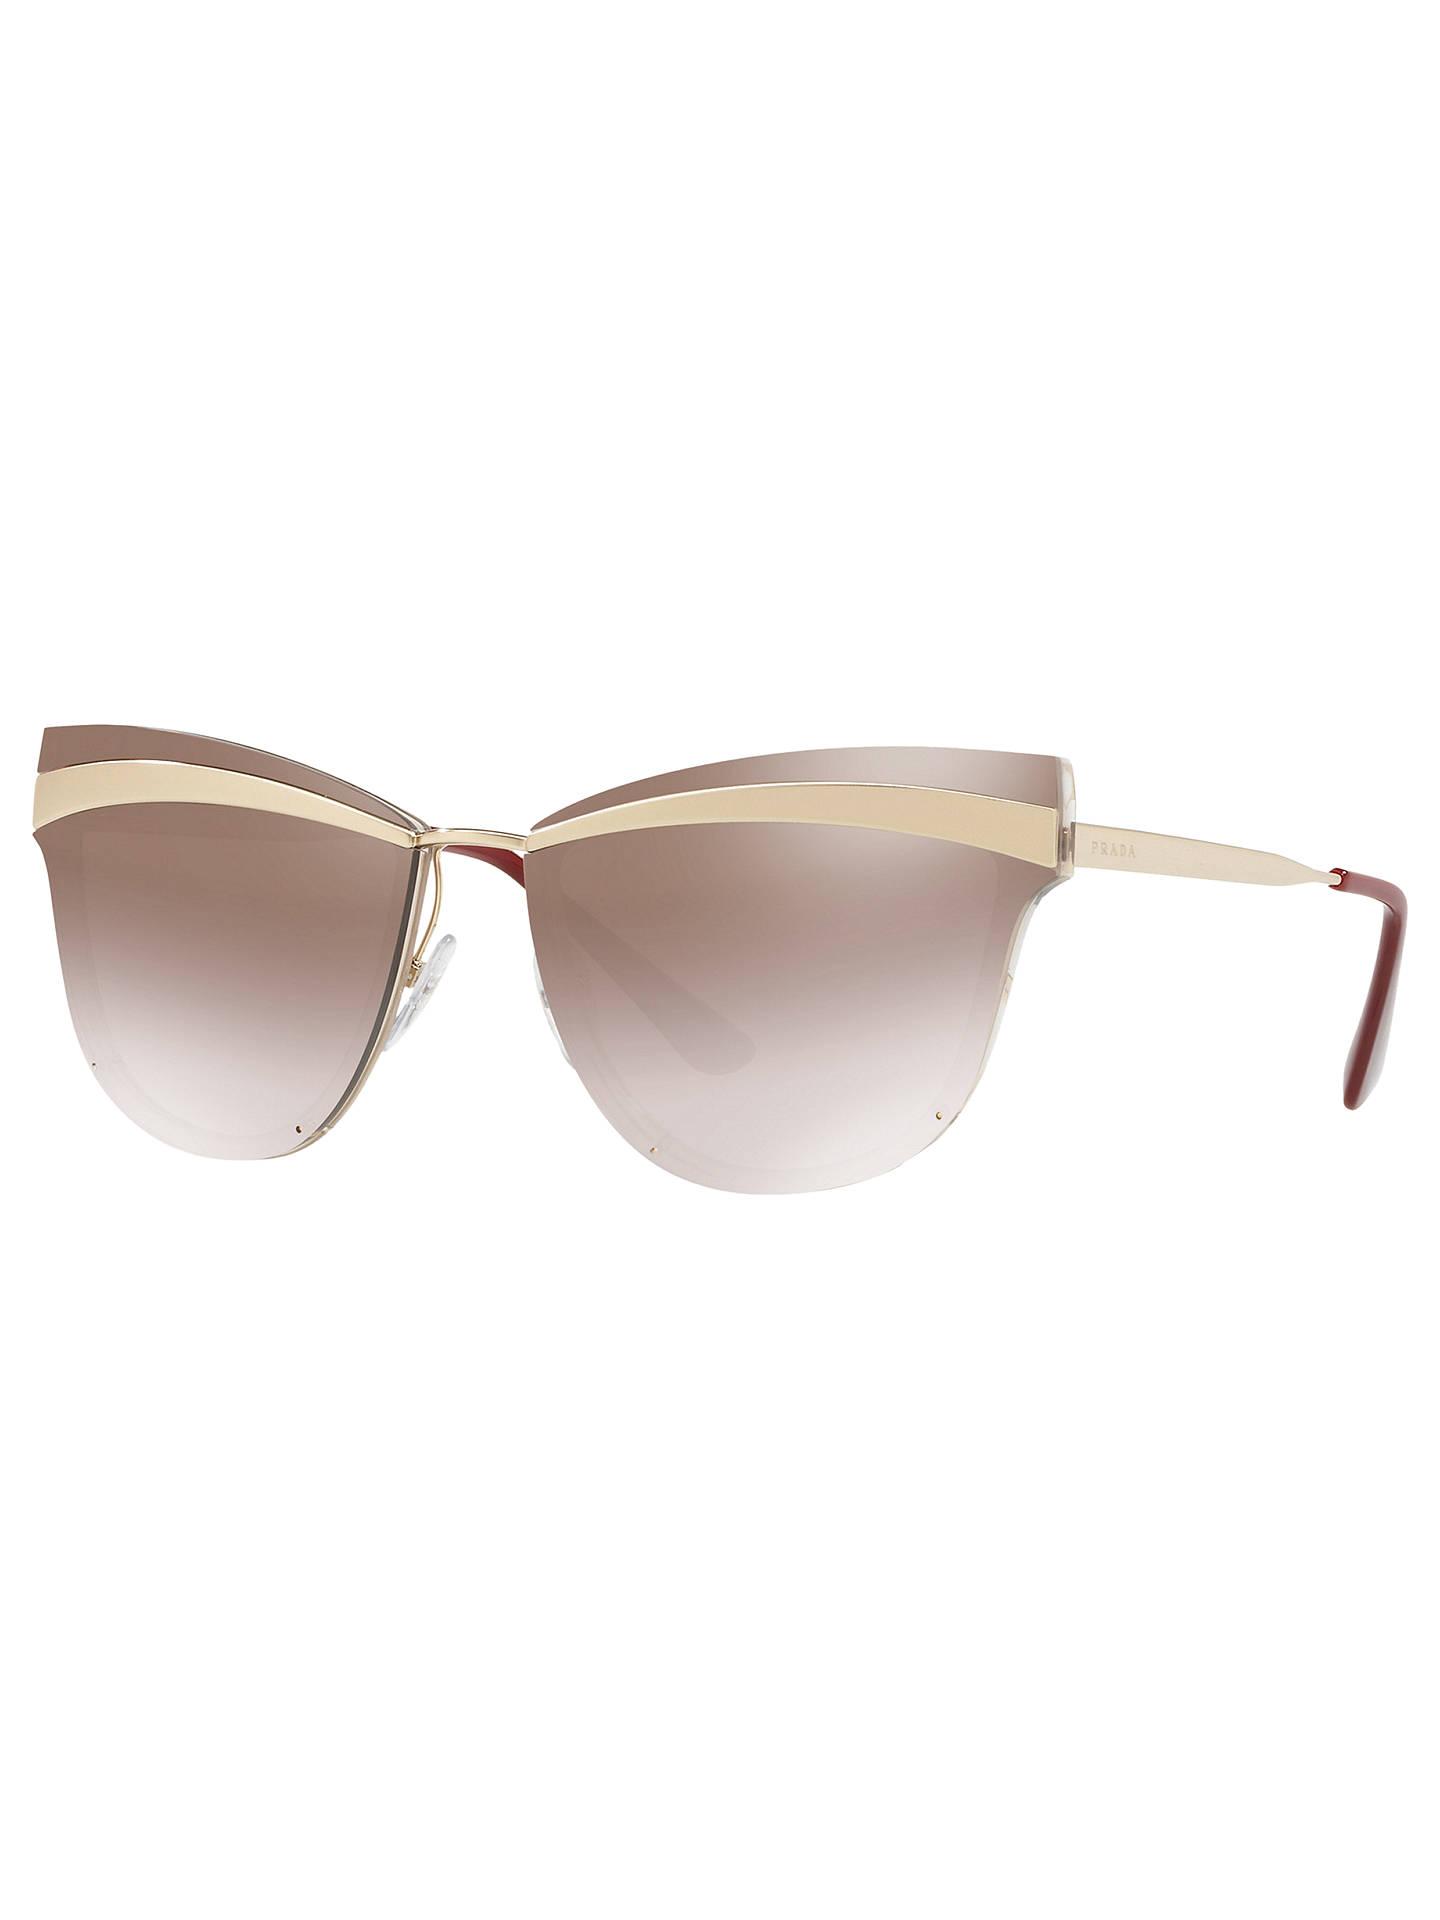 9ffb5e3183c Buy Prada PR 12US Cat s Eye Sunglasses Sunglasses